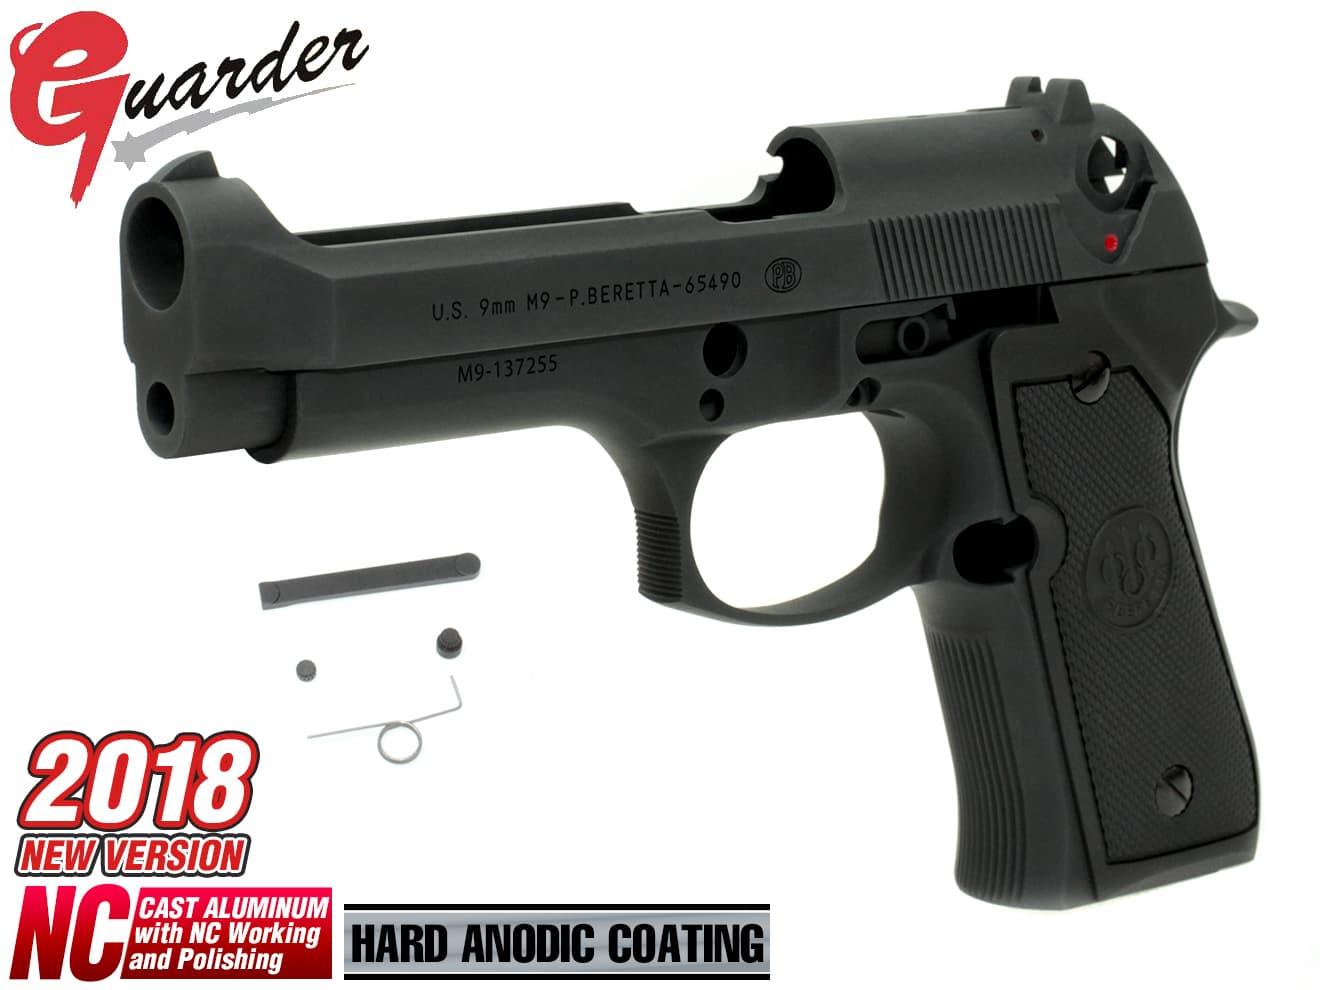 M92F-05(C)BK■GUARDER M9(PB) アルミスライド&フレーム◆2018 ver メタルフレーム 米軍仕様 ベレッタ BERETTA刻印 U.S.9mm M9 リアル刻印 東京マルイ M92F対応